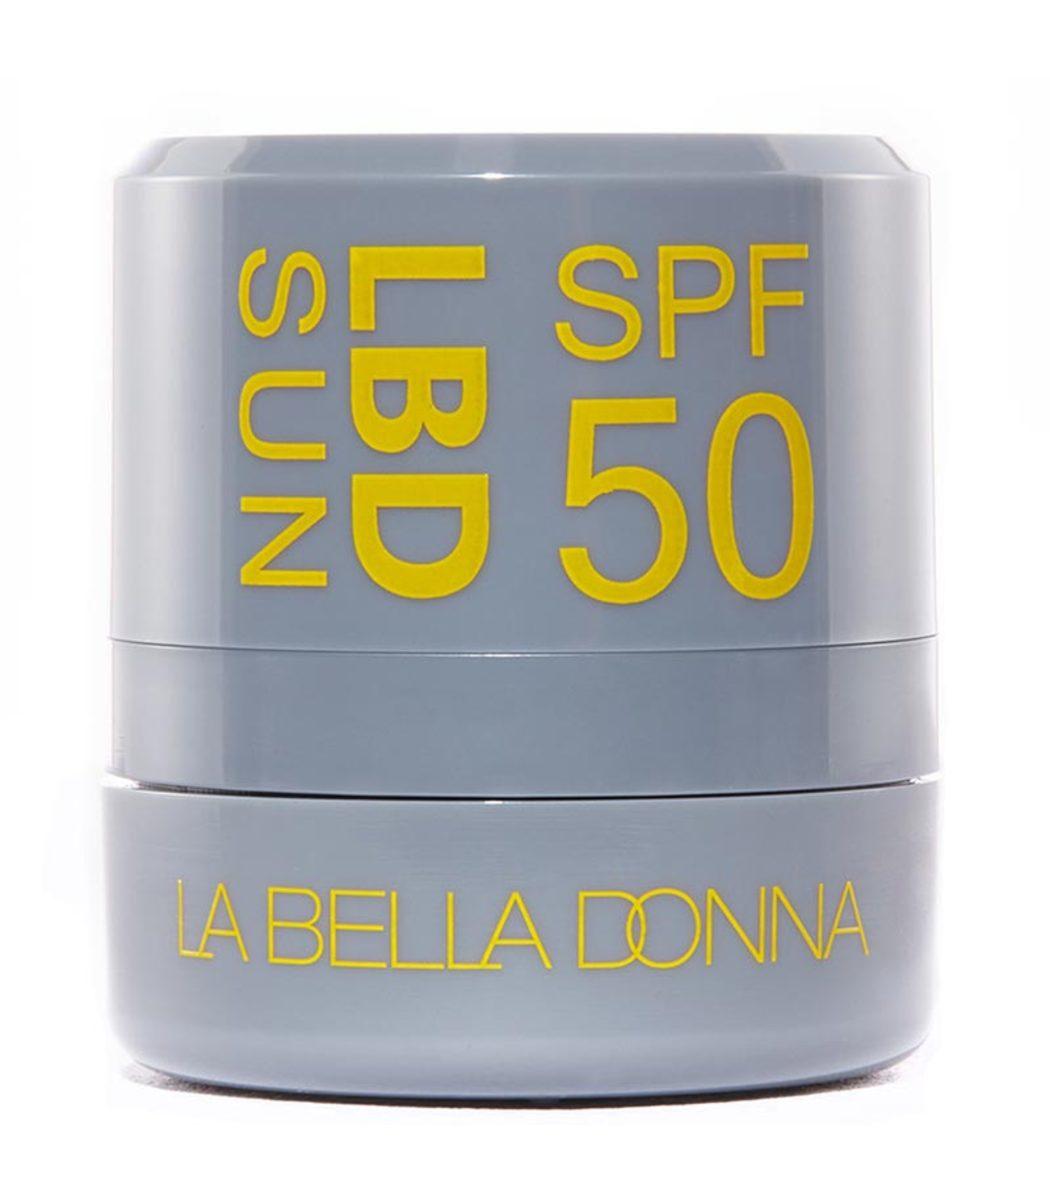 LA BELLA DONNA Lbd Sun Face Powder Sun Protection  Spf 50 in N/A